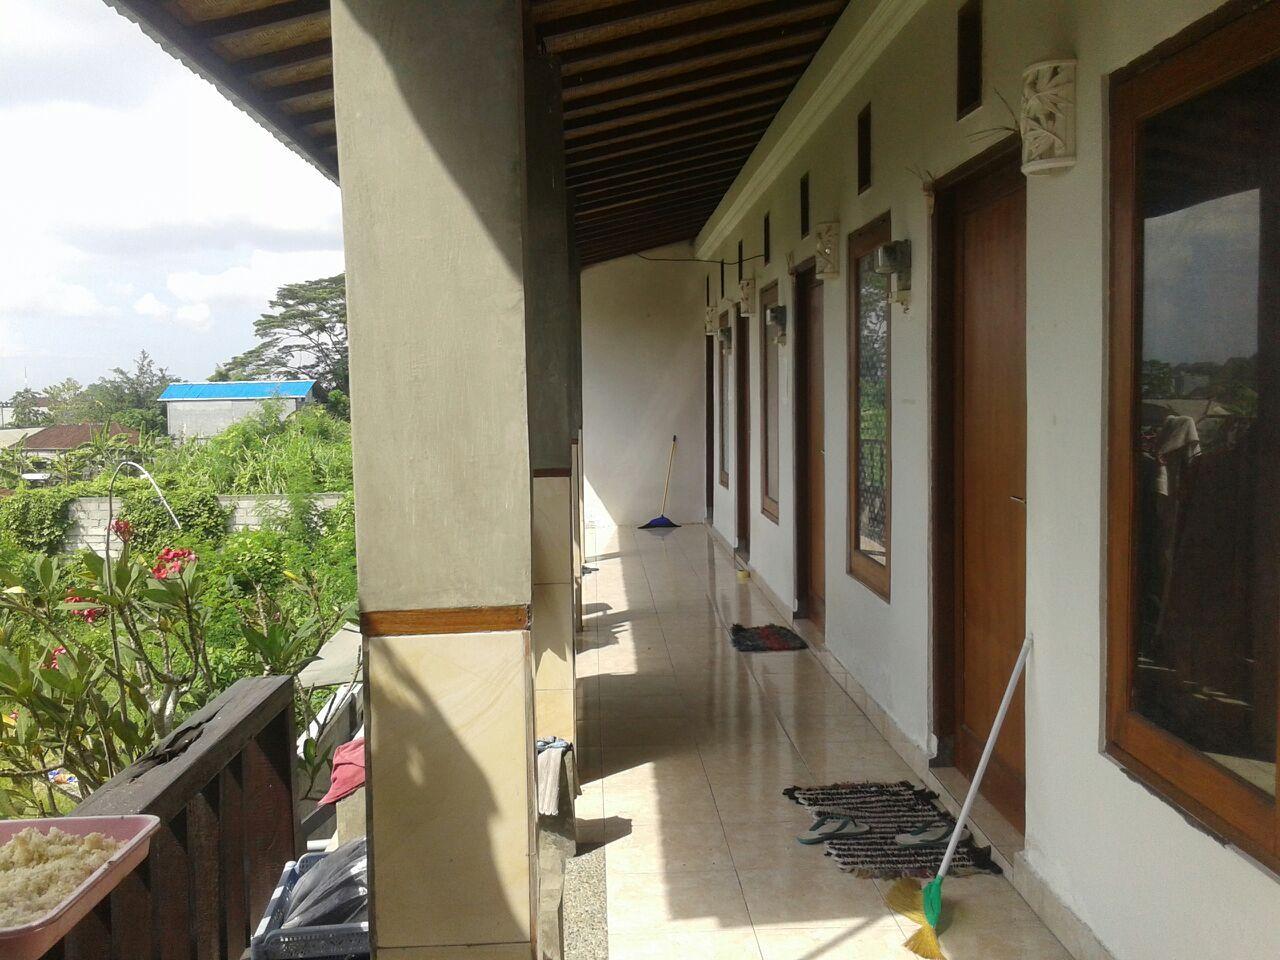 Harga Miring Turun 1 4 M Nego Dijual Kos Kosan 2 Lantai Luas Tanah 150 M2 Bangunan 200 10 R Tidur Mandi Dalam Dan Dapur